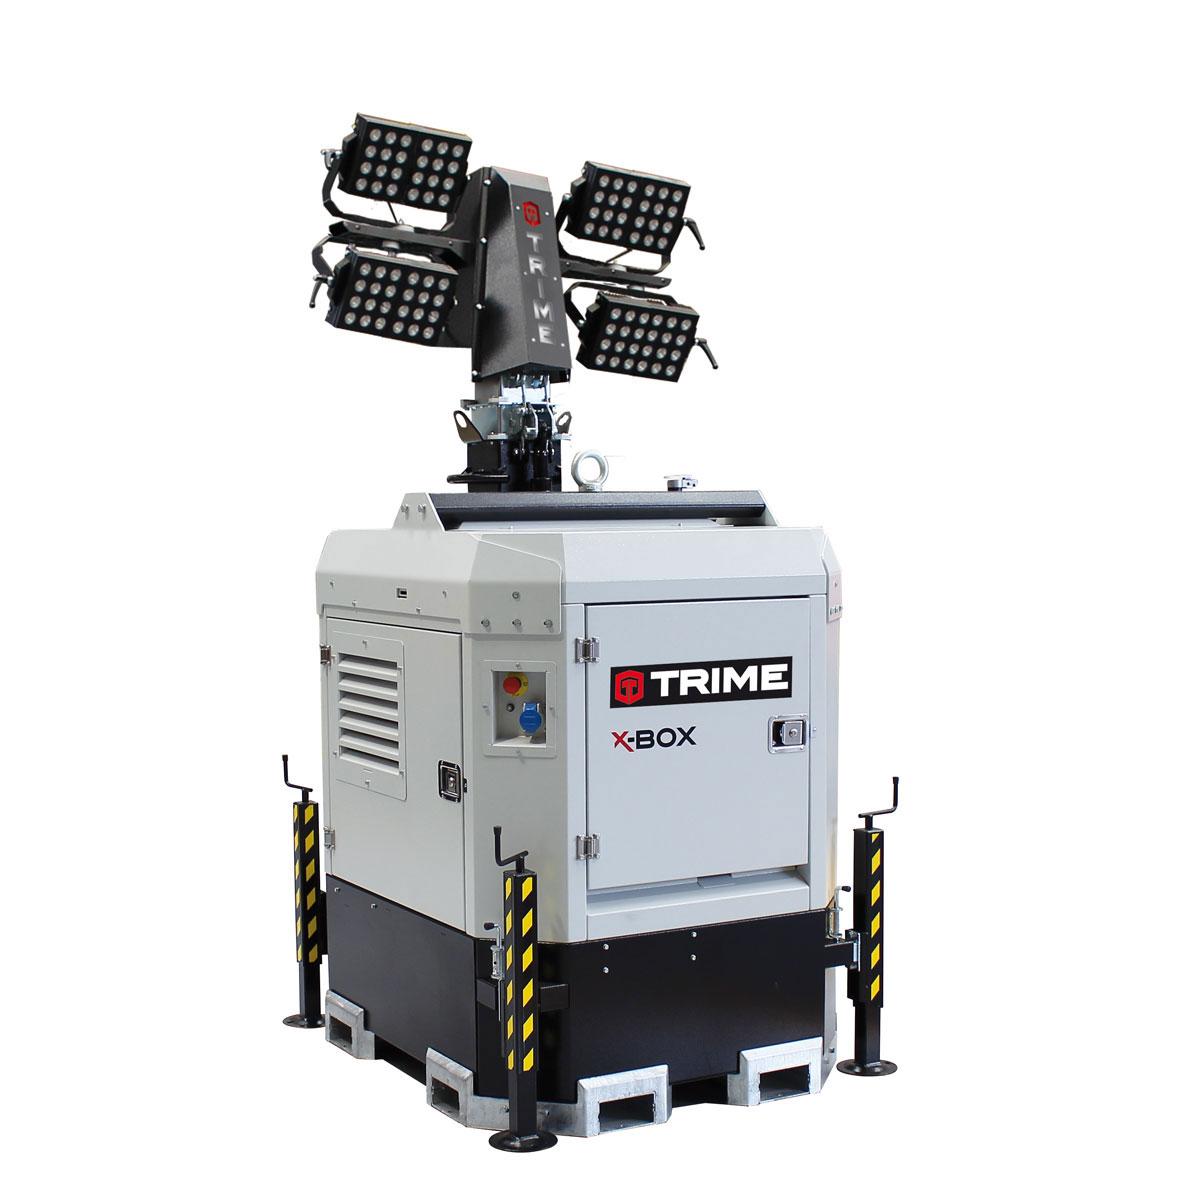 belysningsmast-led-x-box-4x300W-48V-stangd